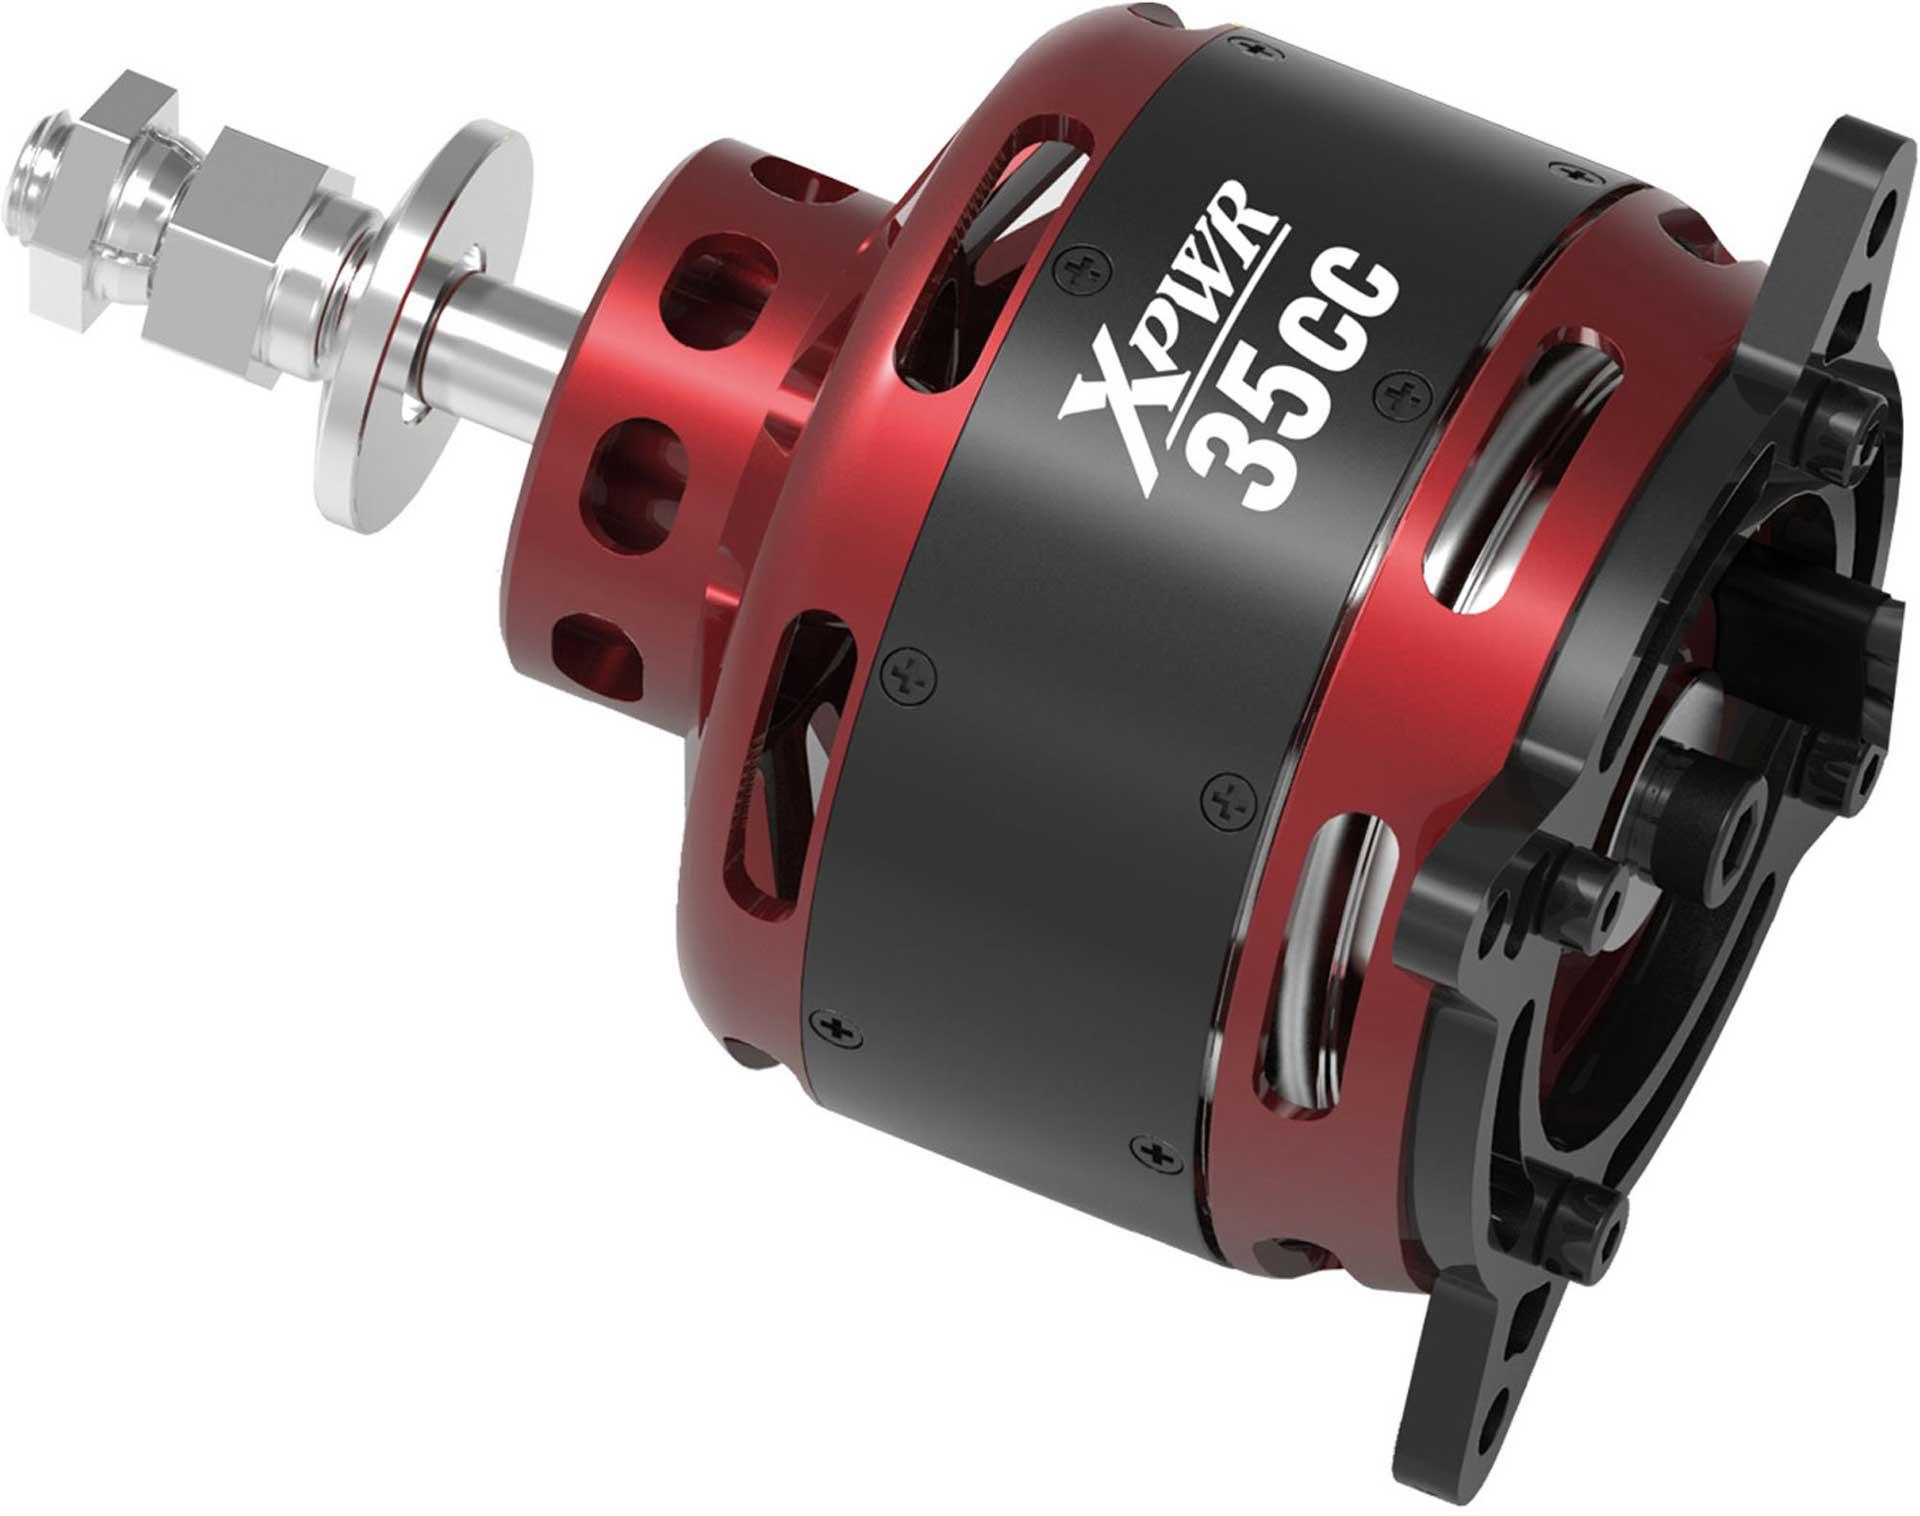 EXTREMEFLIGHT-RC XPWR 35CC BRUSHLESS MOTOR 220 K/V